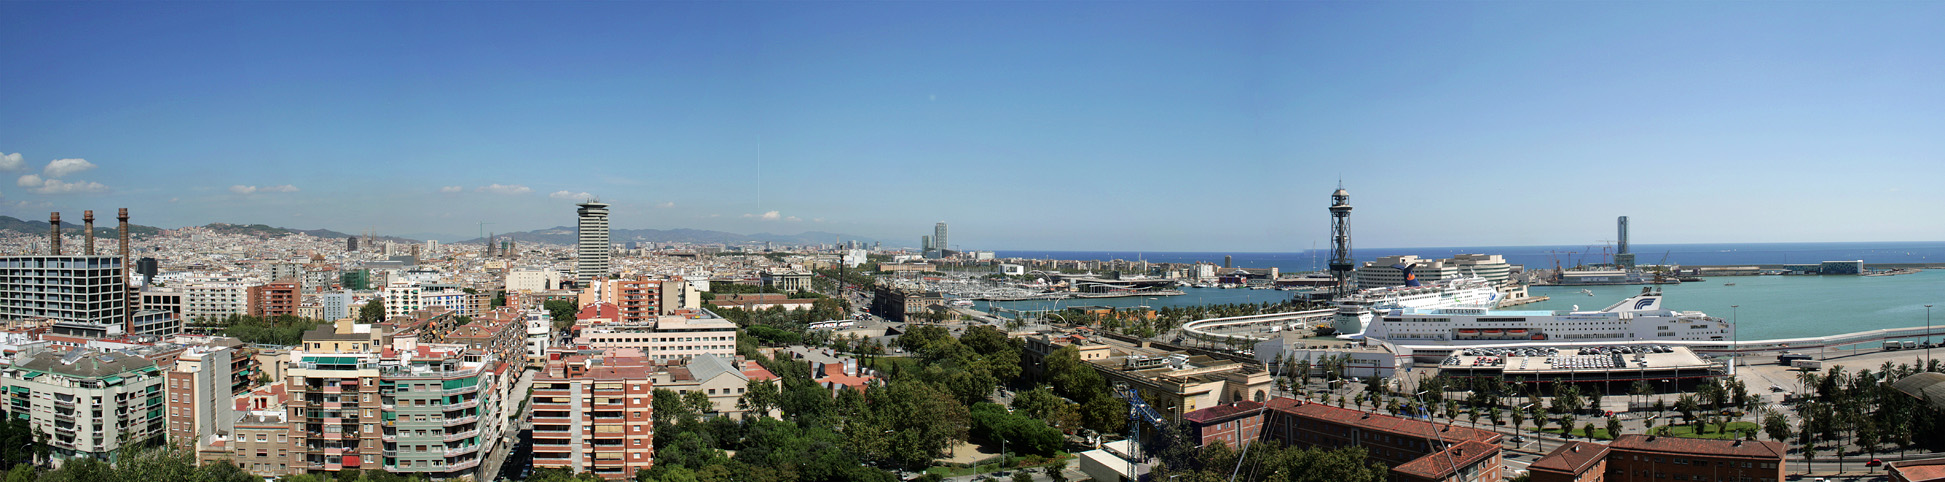 Pano Barcelona 2